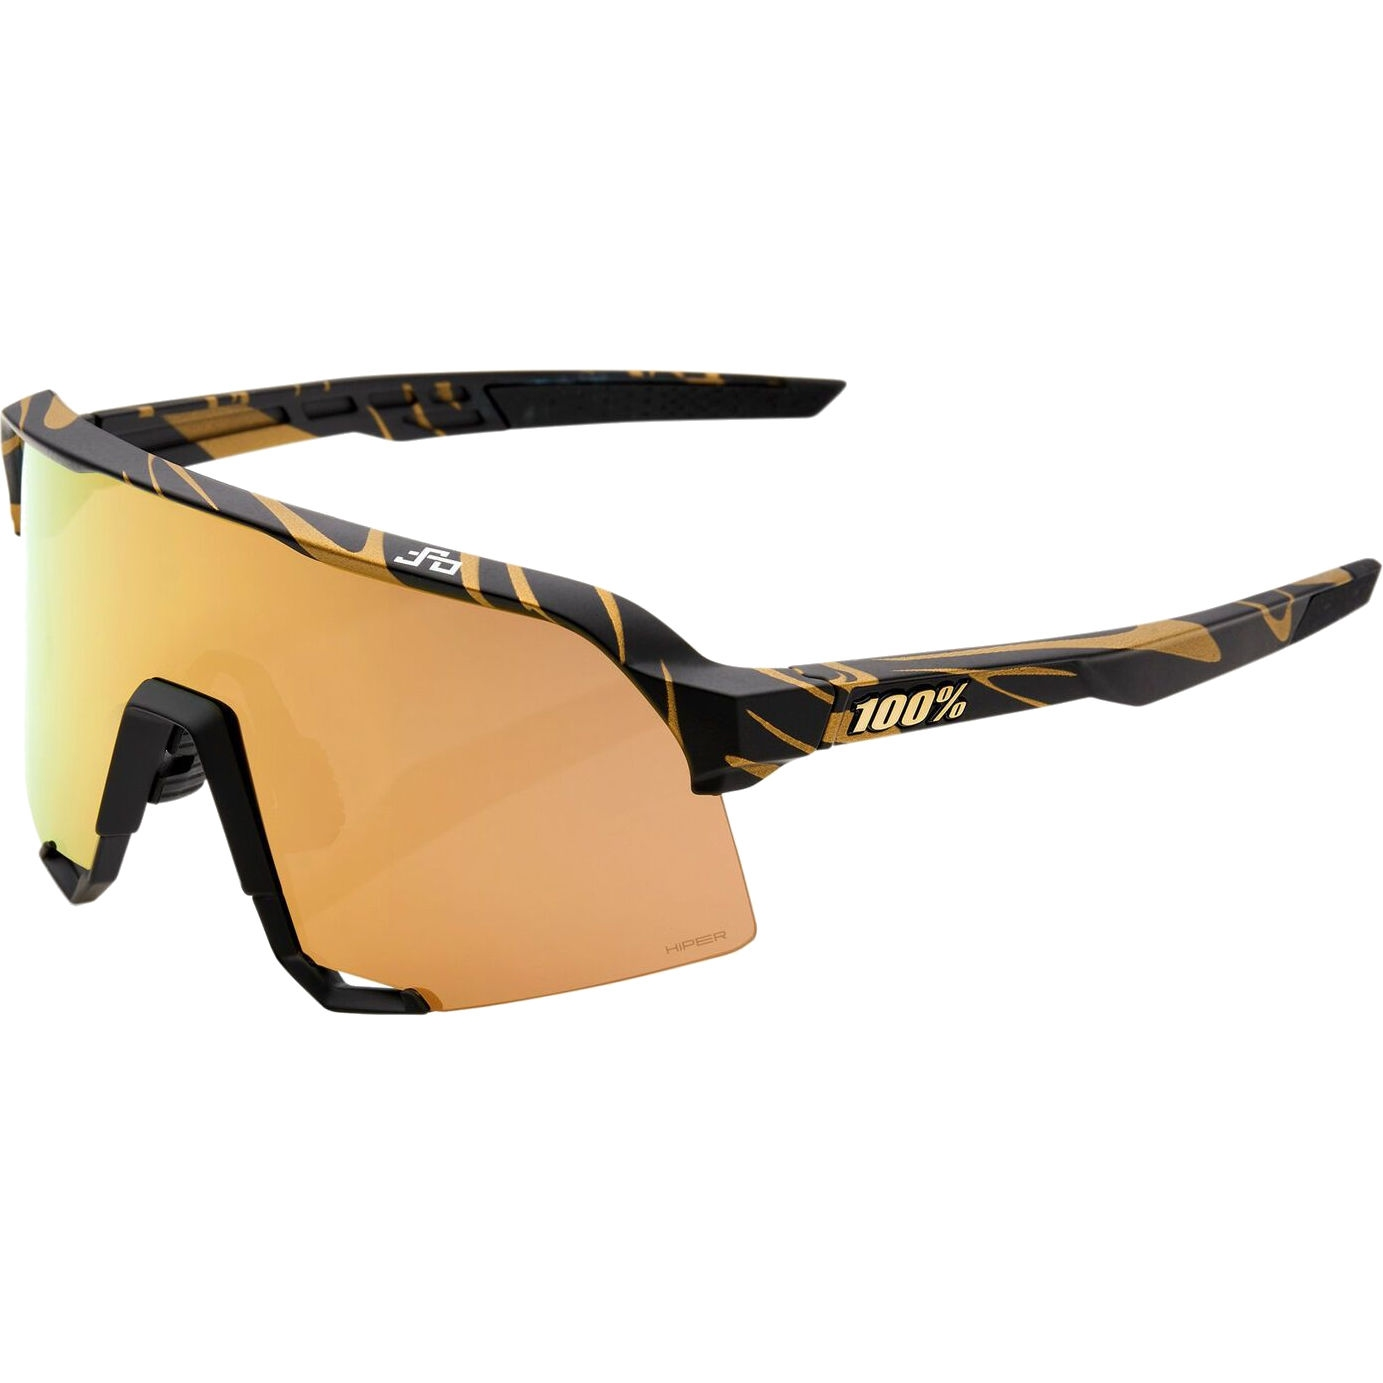 100% S3 LE HiPER Lens Glasses - Peter Sagan Special Edition - Metallic Gold Flake